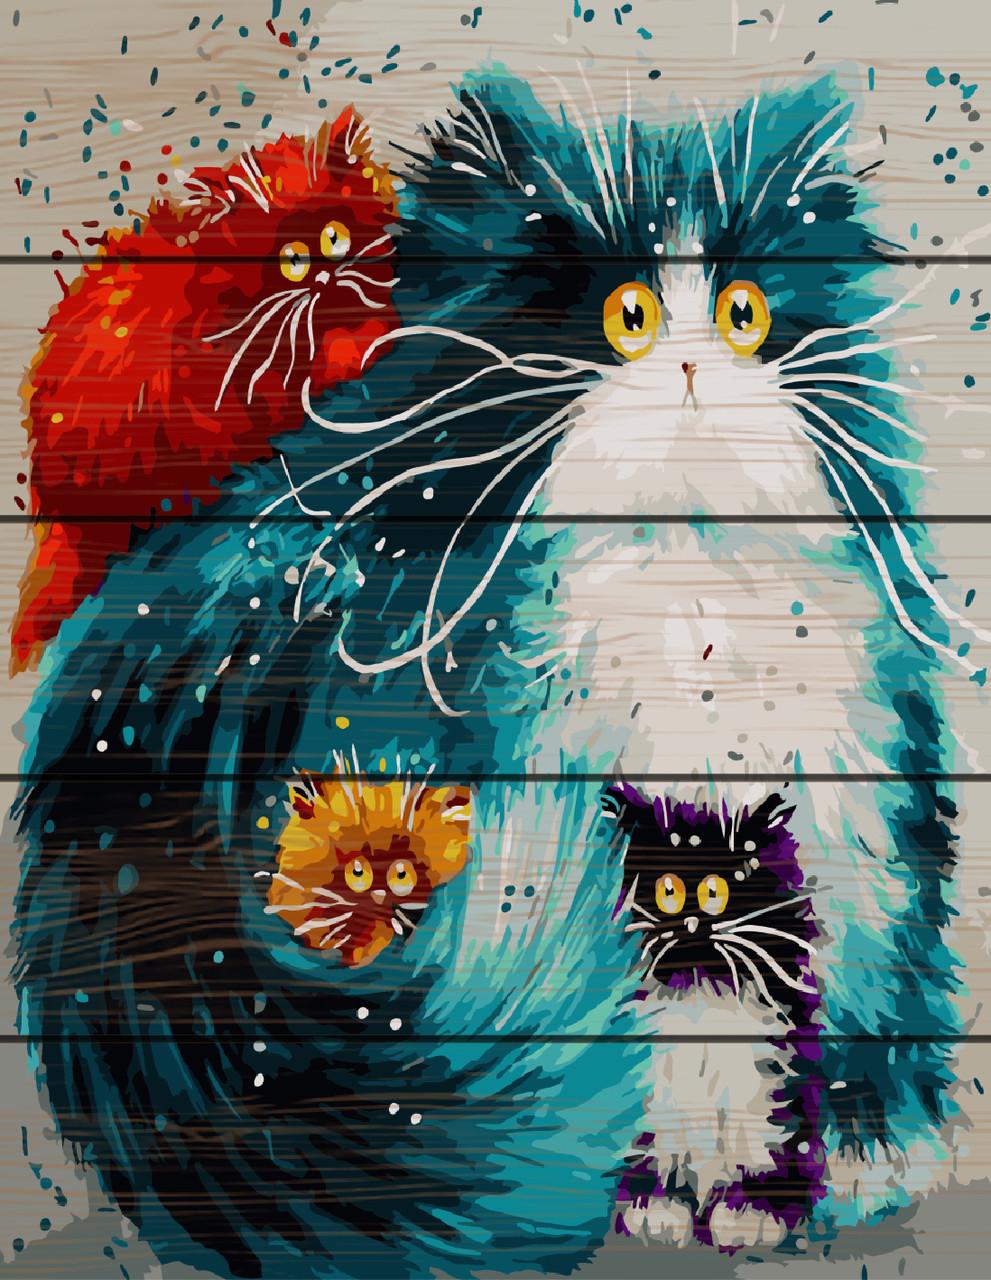 PREMIUM Картина по номерам на дереве 40х50 см.  Цветные коты Rainbow Art